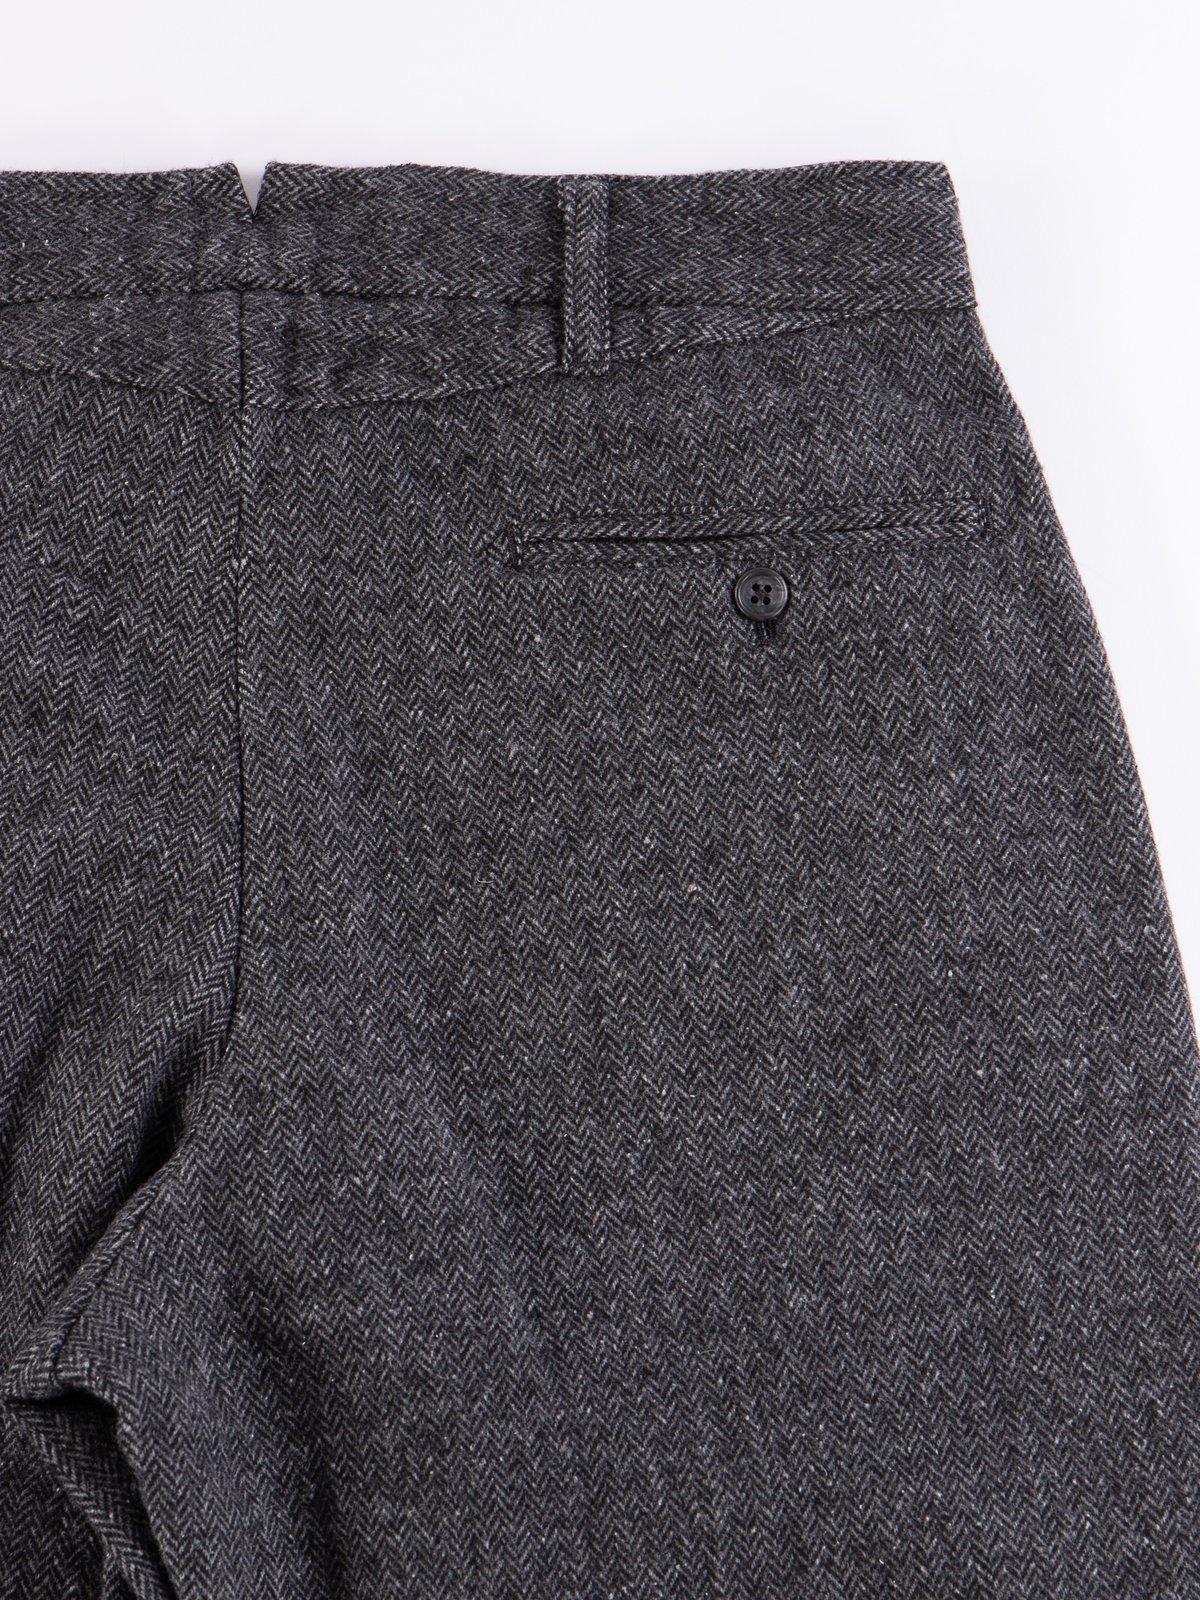 Grey Poly Wool Herringbone Andover Pant - Image 6